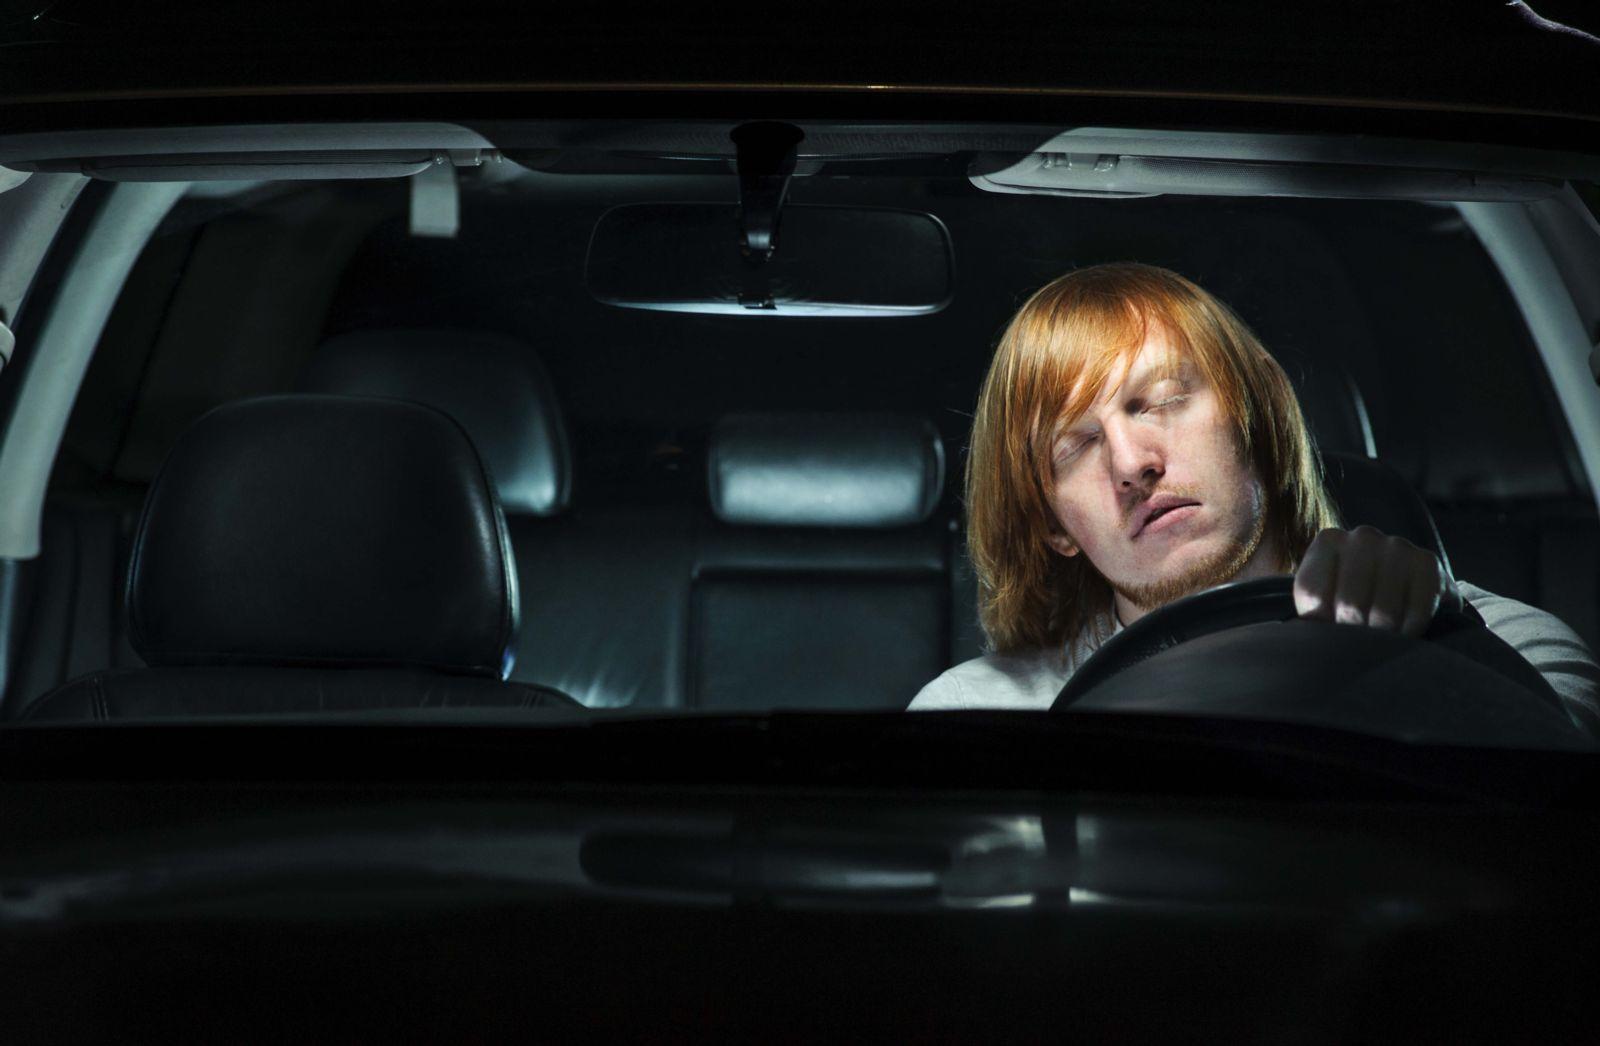 Florida Criminal Defense Car Accident Lawyer Drowsy Driving Izquierdo Law